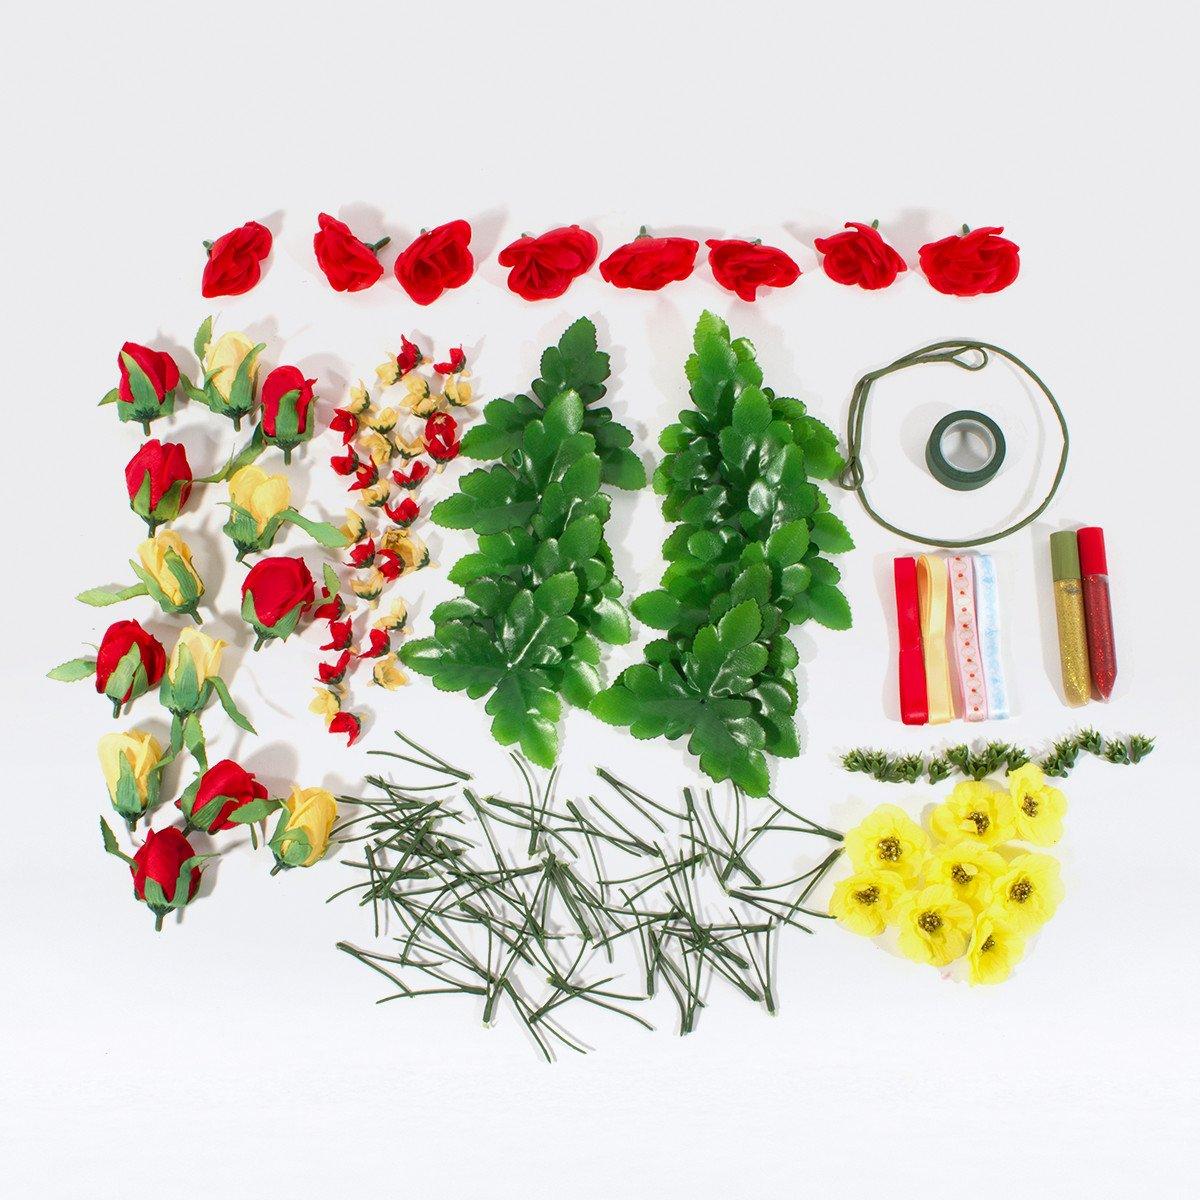 Amazon seedling disneys beauty and the beast design your own amazon seedling disneys beauty and the beast design your own enchanted flower rose crown activity kit toys games izmirmasajfo